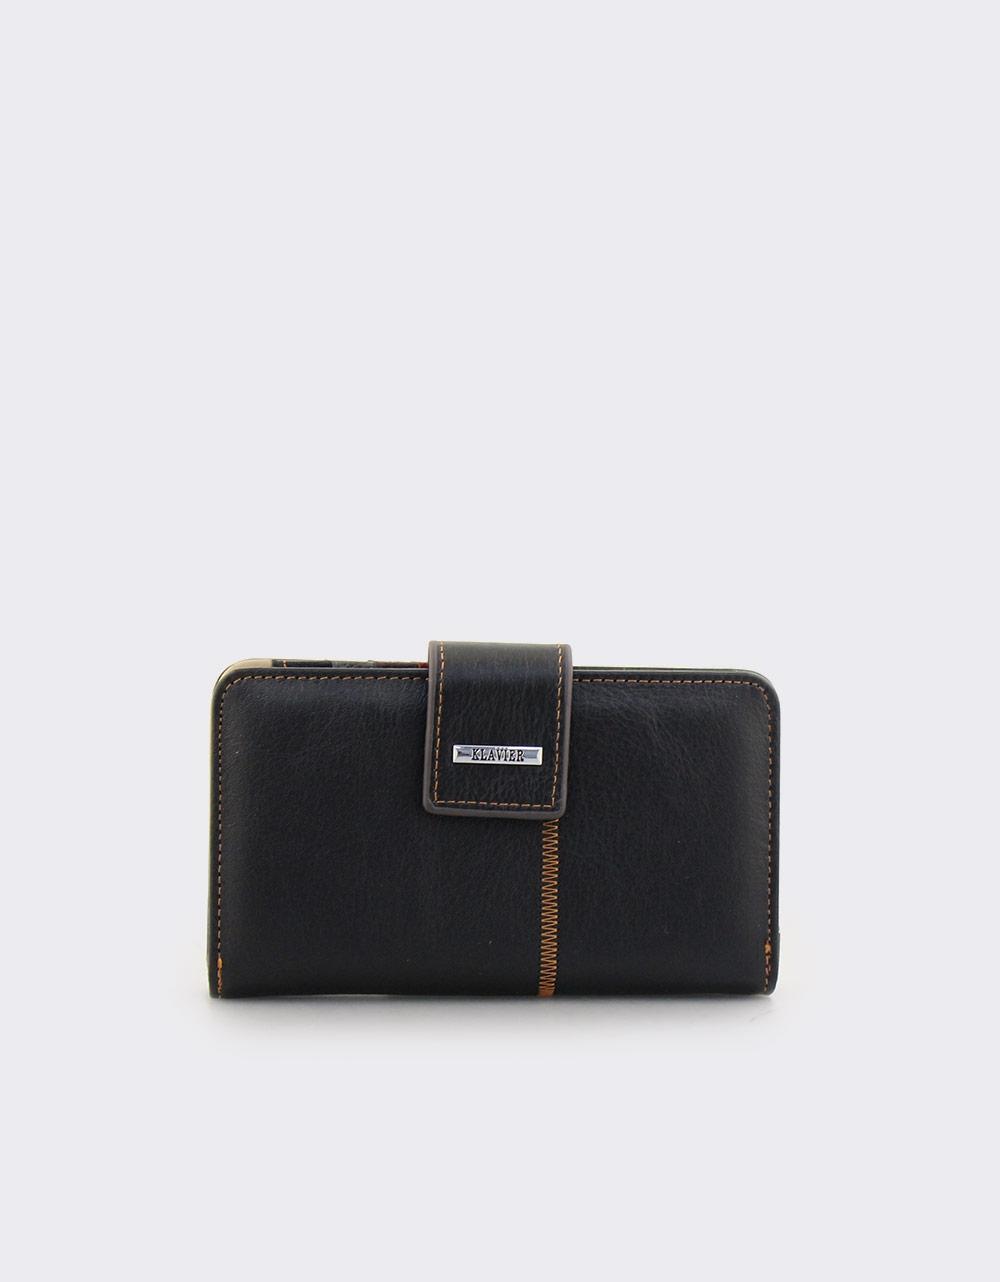 28dfca3e58 Εικόνα από Γυναικεία πορτοφόλια δερμάτινα με διακοσμητική λεπτομέρεια Μαύρο